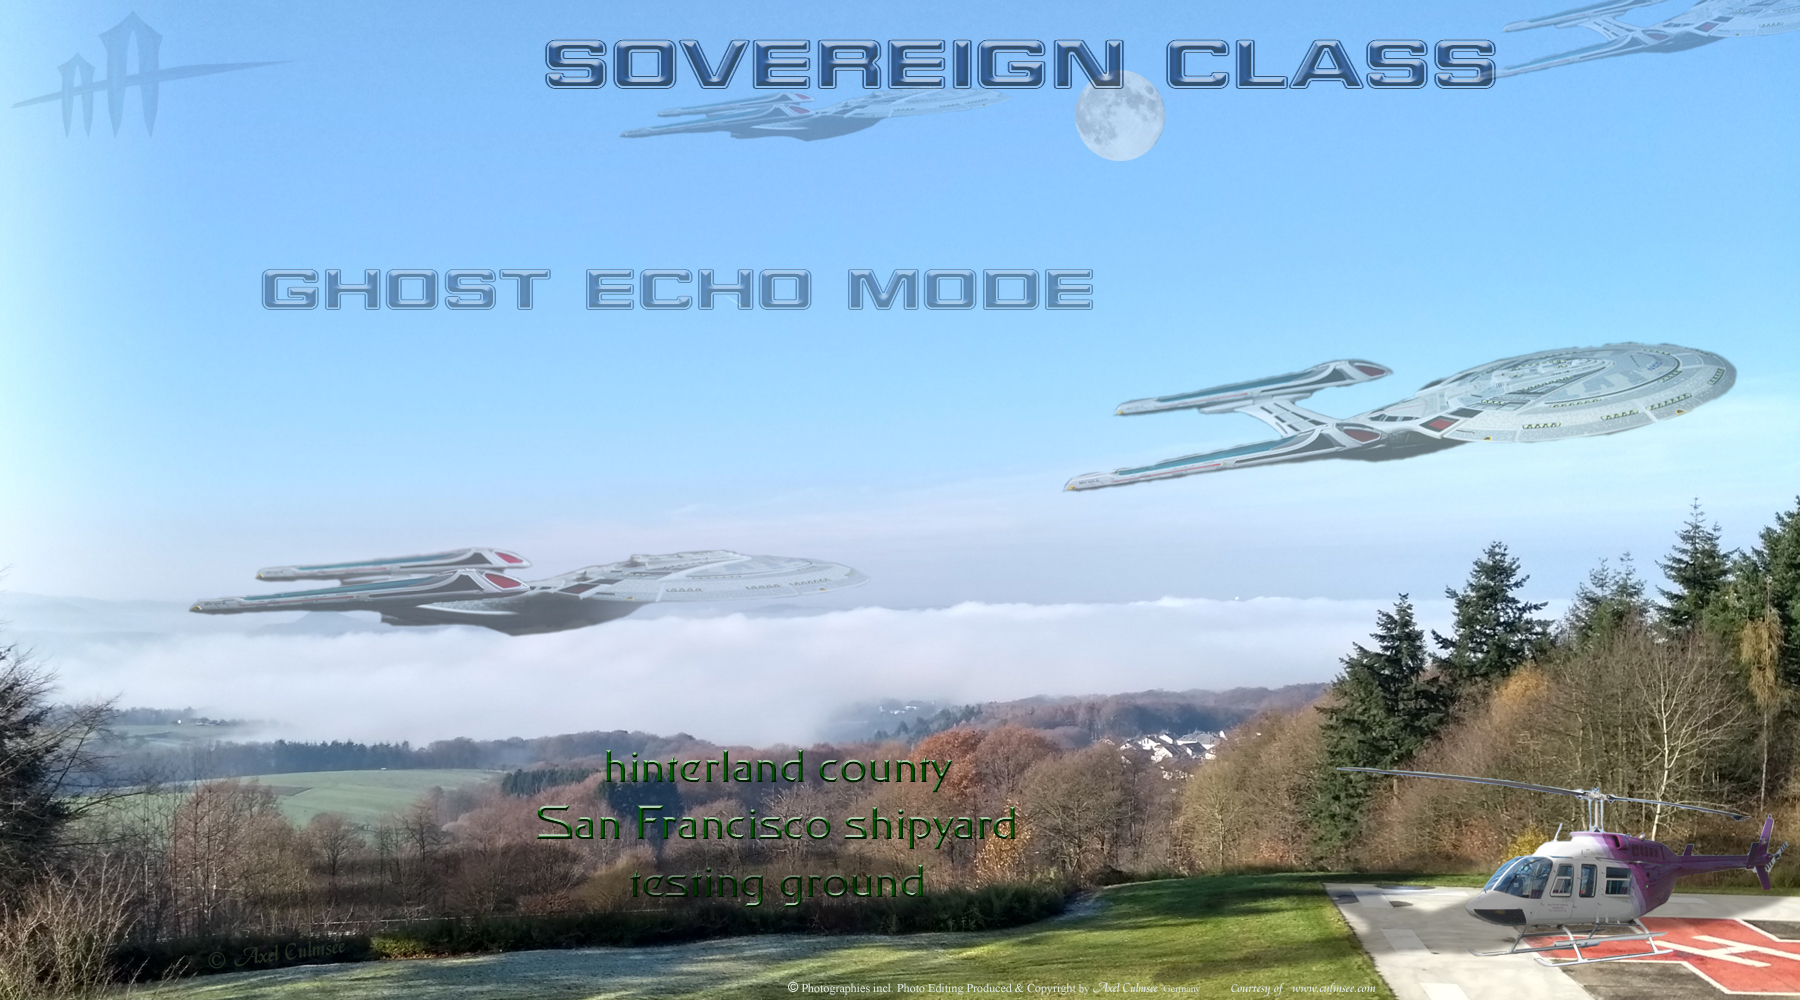 Sovereign class ghost echo mode across hinterland county San Francisco shipyard testing ground NCC-1701-E